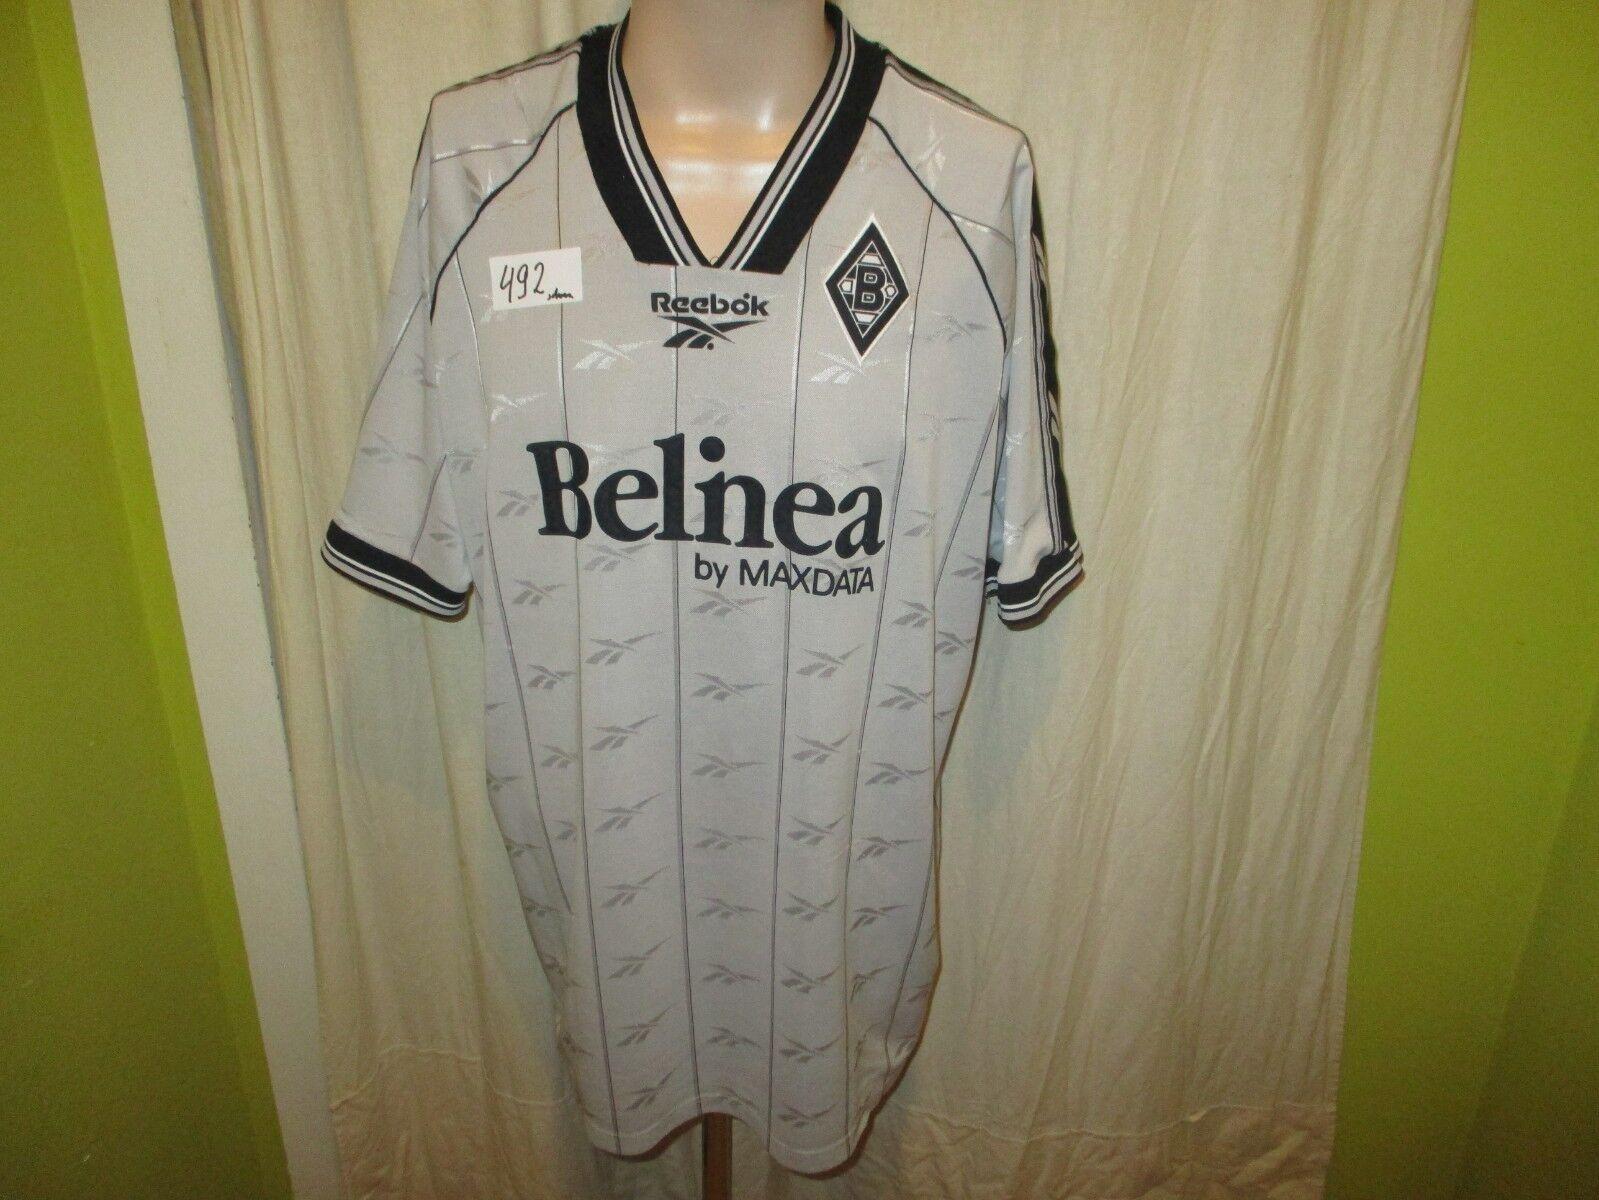 Borussia Mönchengladbach Reebok Trikot 1997 98  Belinea by Maxdata  Gr.XXL